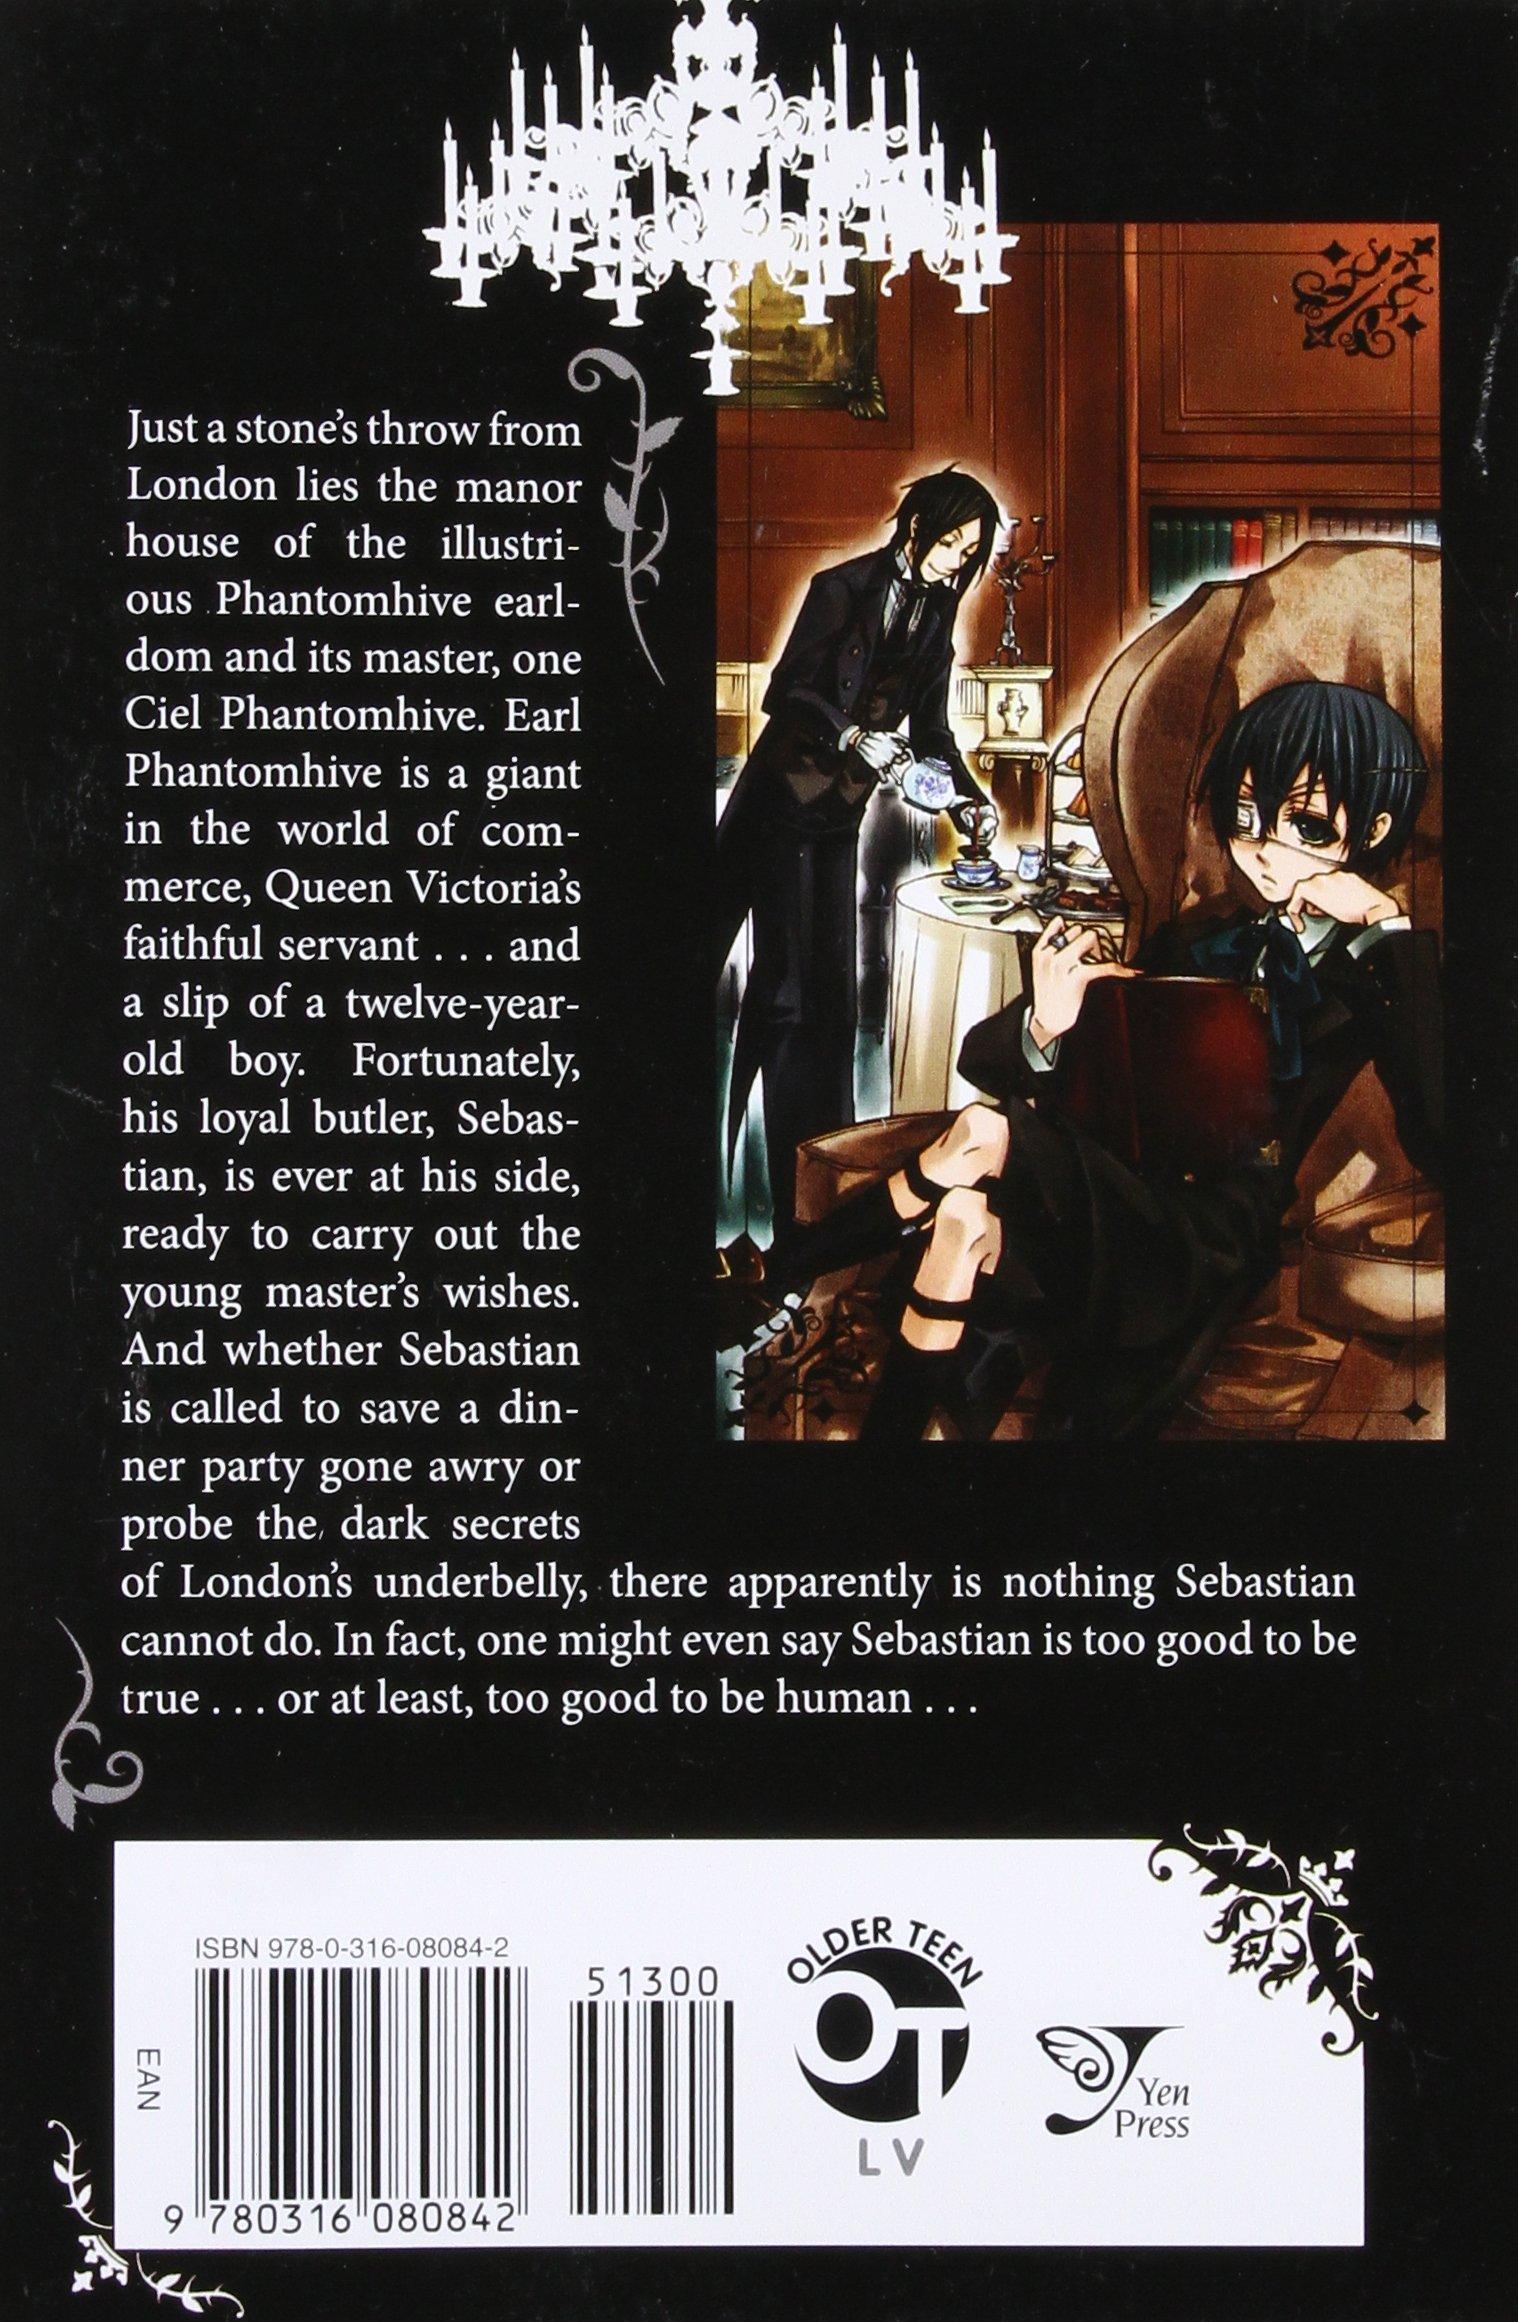 Amazon com: Black Butler, Vol  1 (9780316080842): Yana